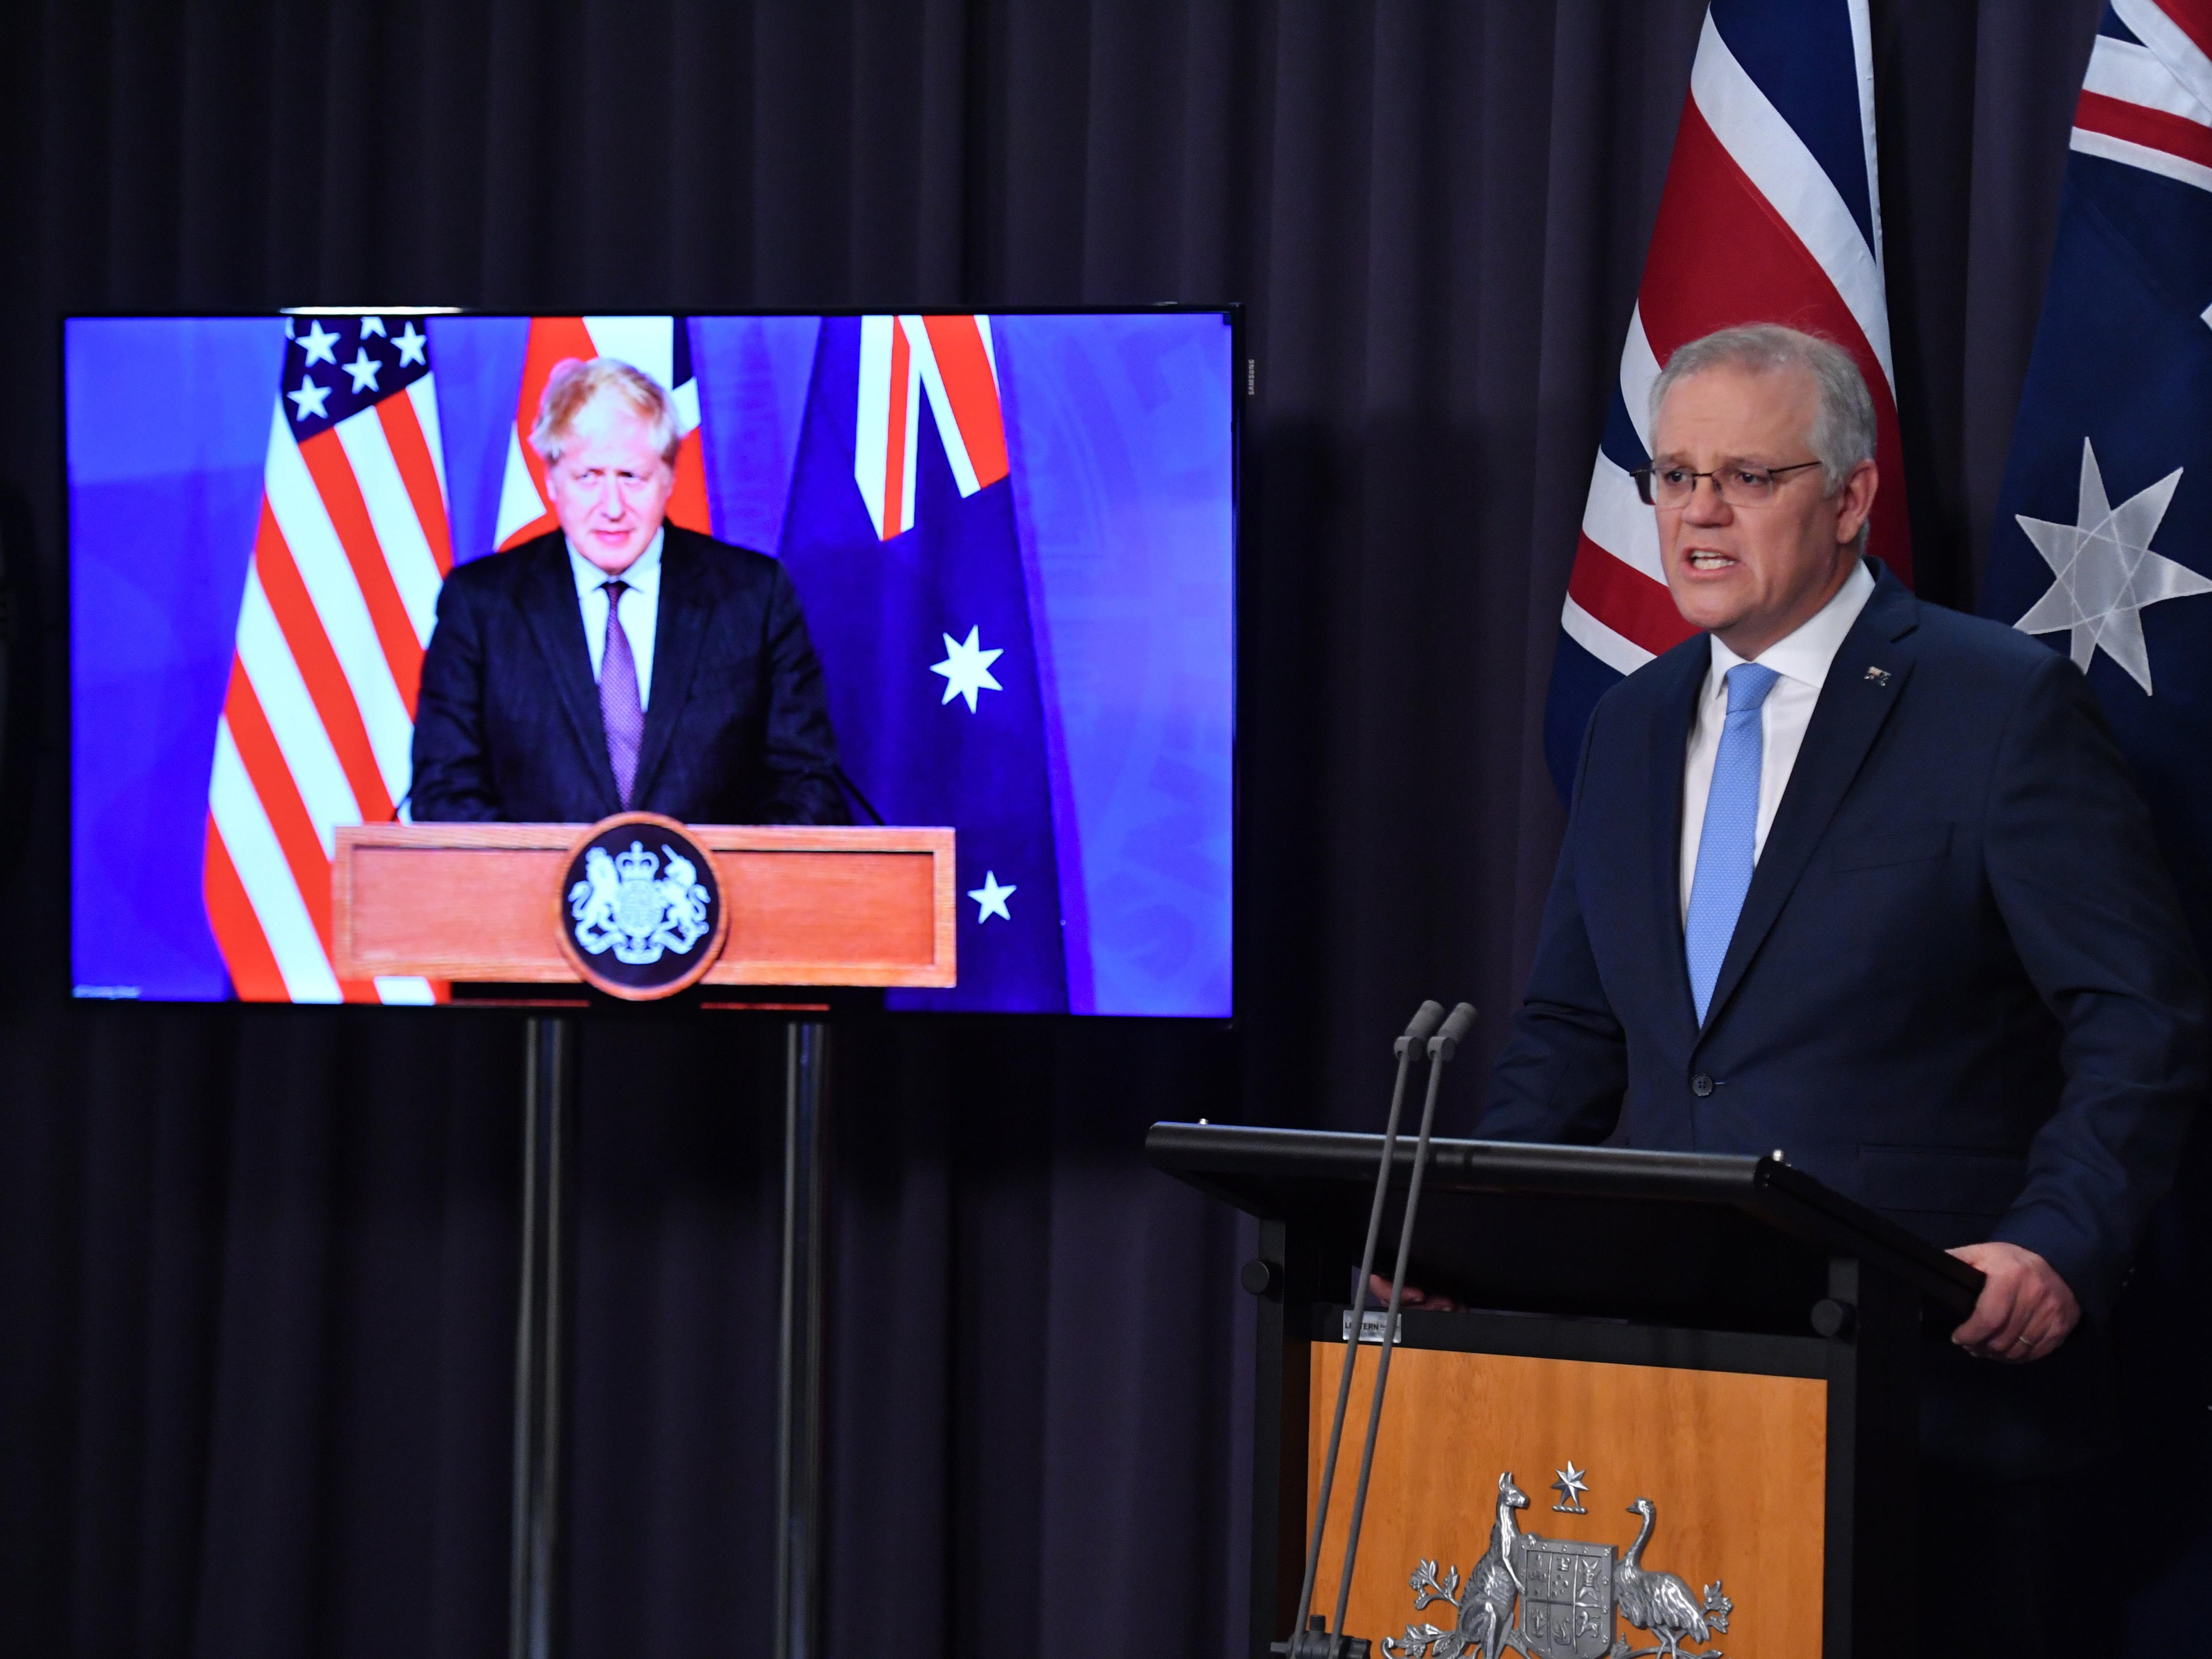 <p>Australian prime minister Scott Morrison announced the new AUKUS alliance (Australië, UK and US) with Boris Johnson earlier this week<blp>